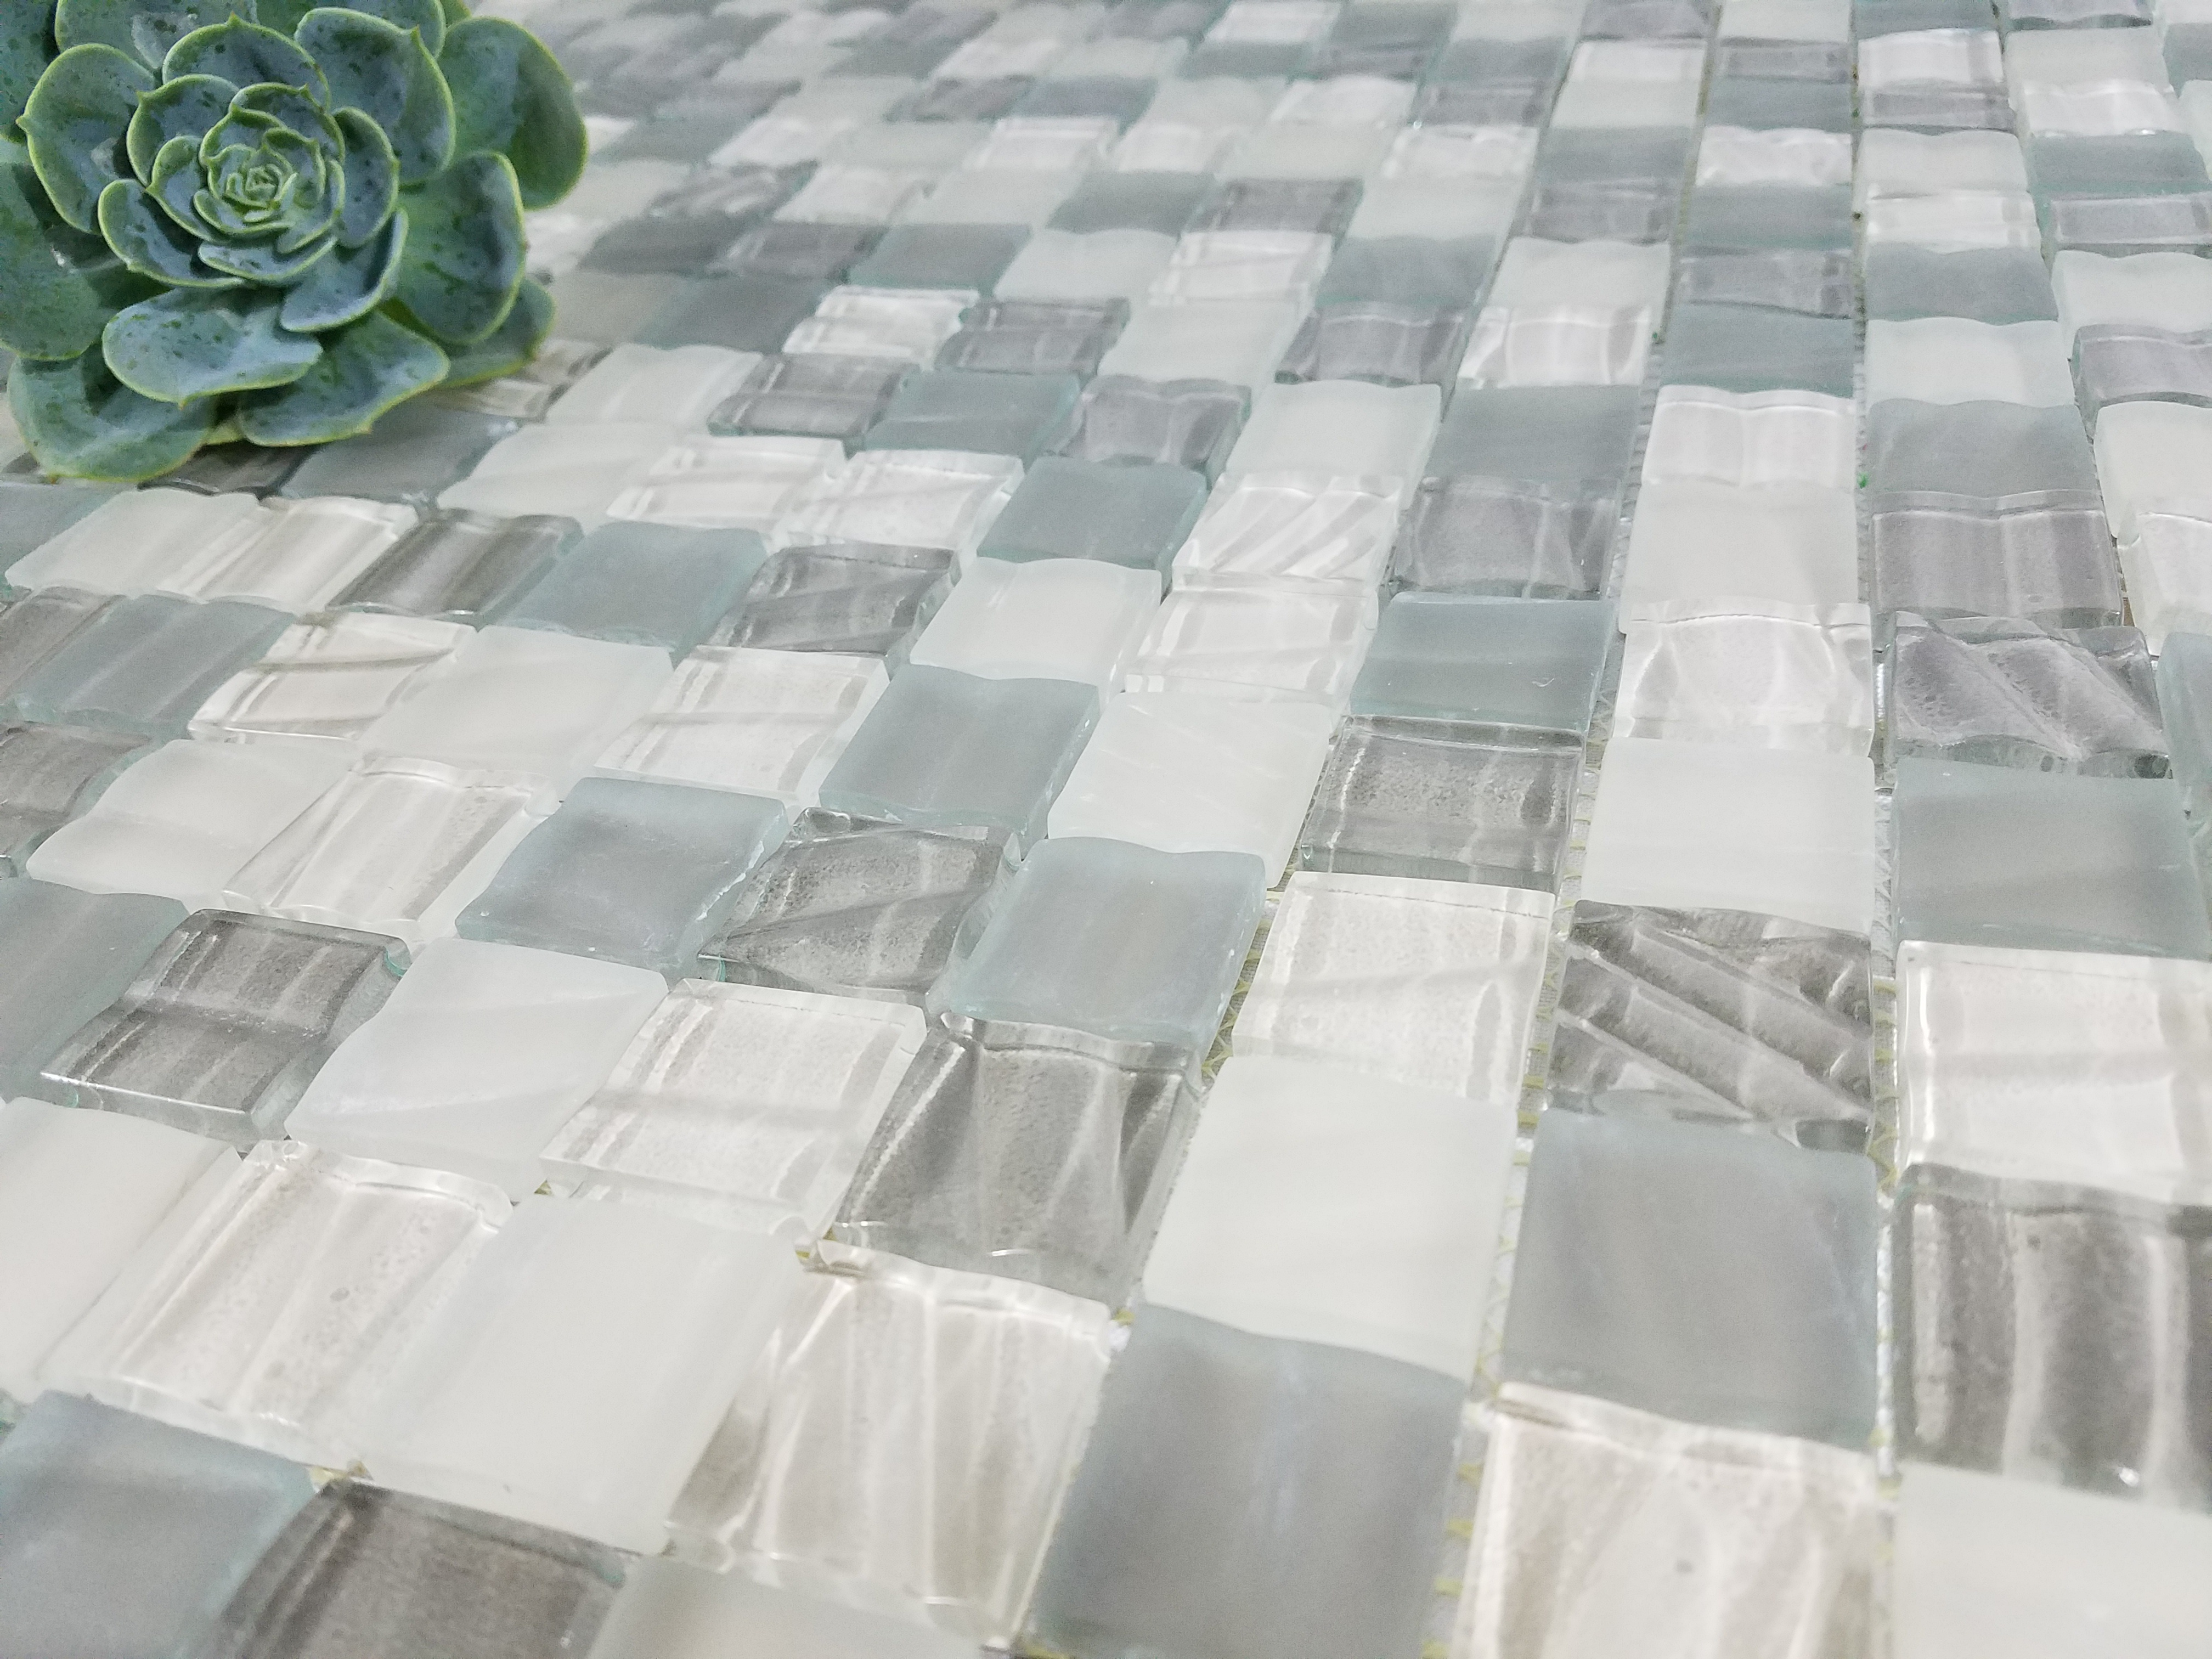 "New Era 1"" x 1"" Glossy Gray Glass Square Backsplash Mosaic Wall & Floor Tile"